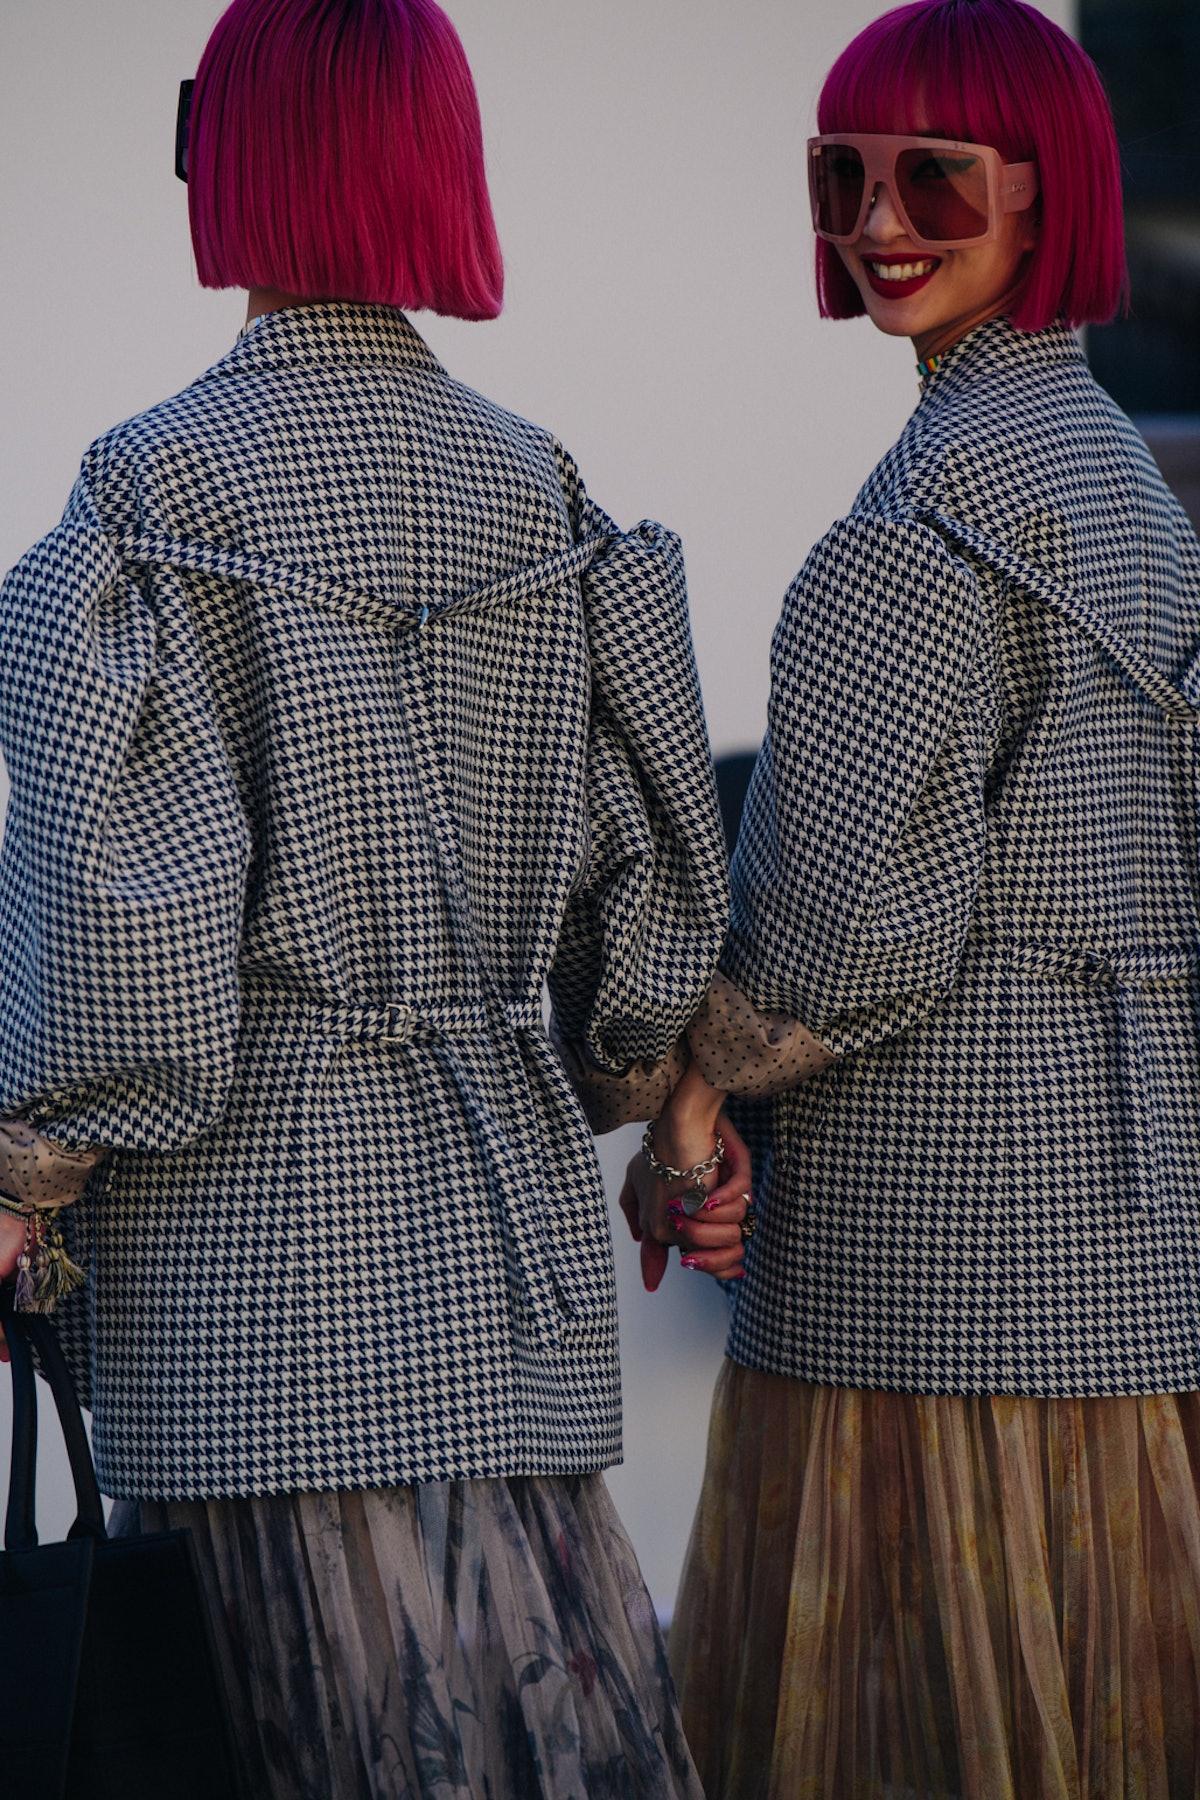 Adam-Katz-Sinding-W-Magazine-Paris-Fashion-Week-Fall-Winter-2019-2020_AKS3605.jpg